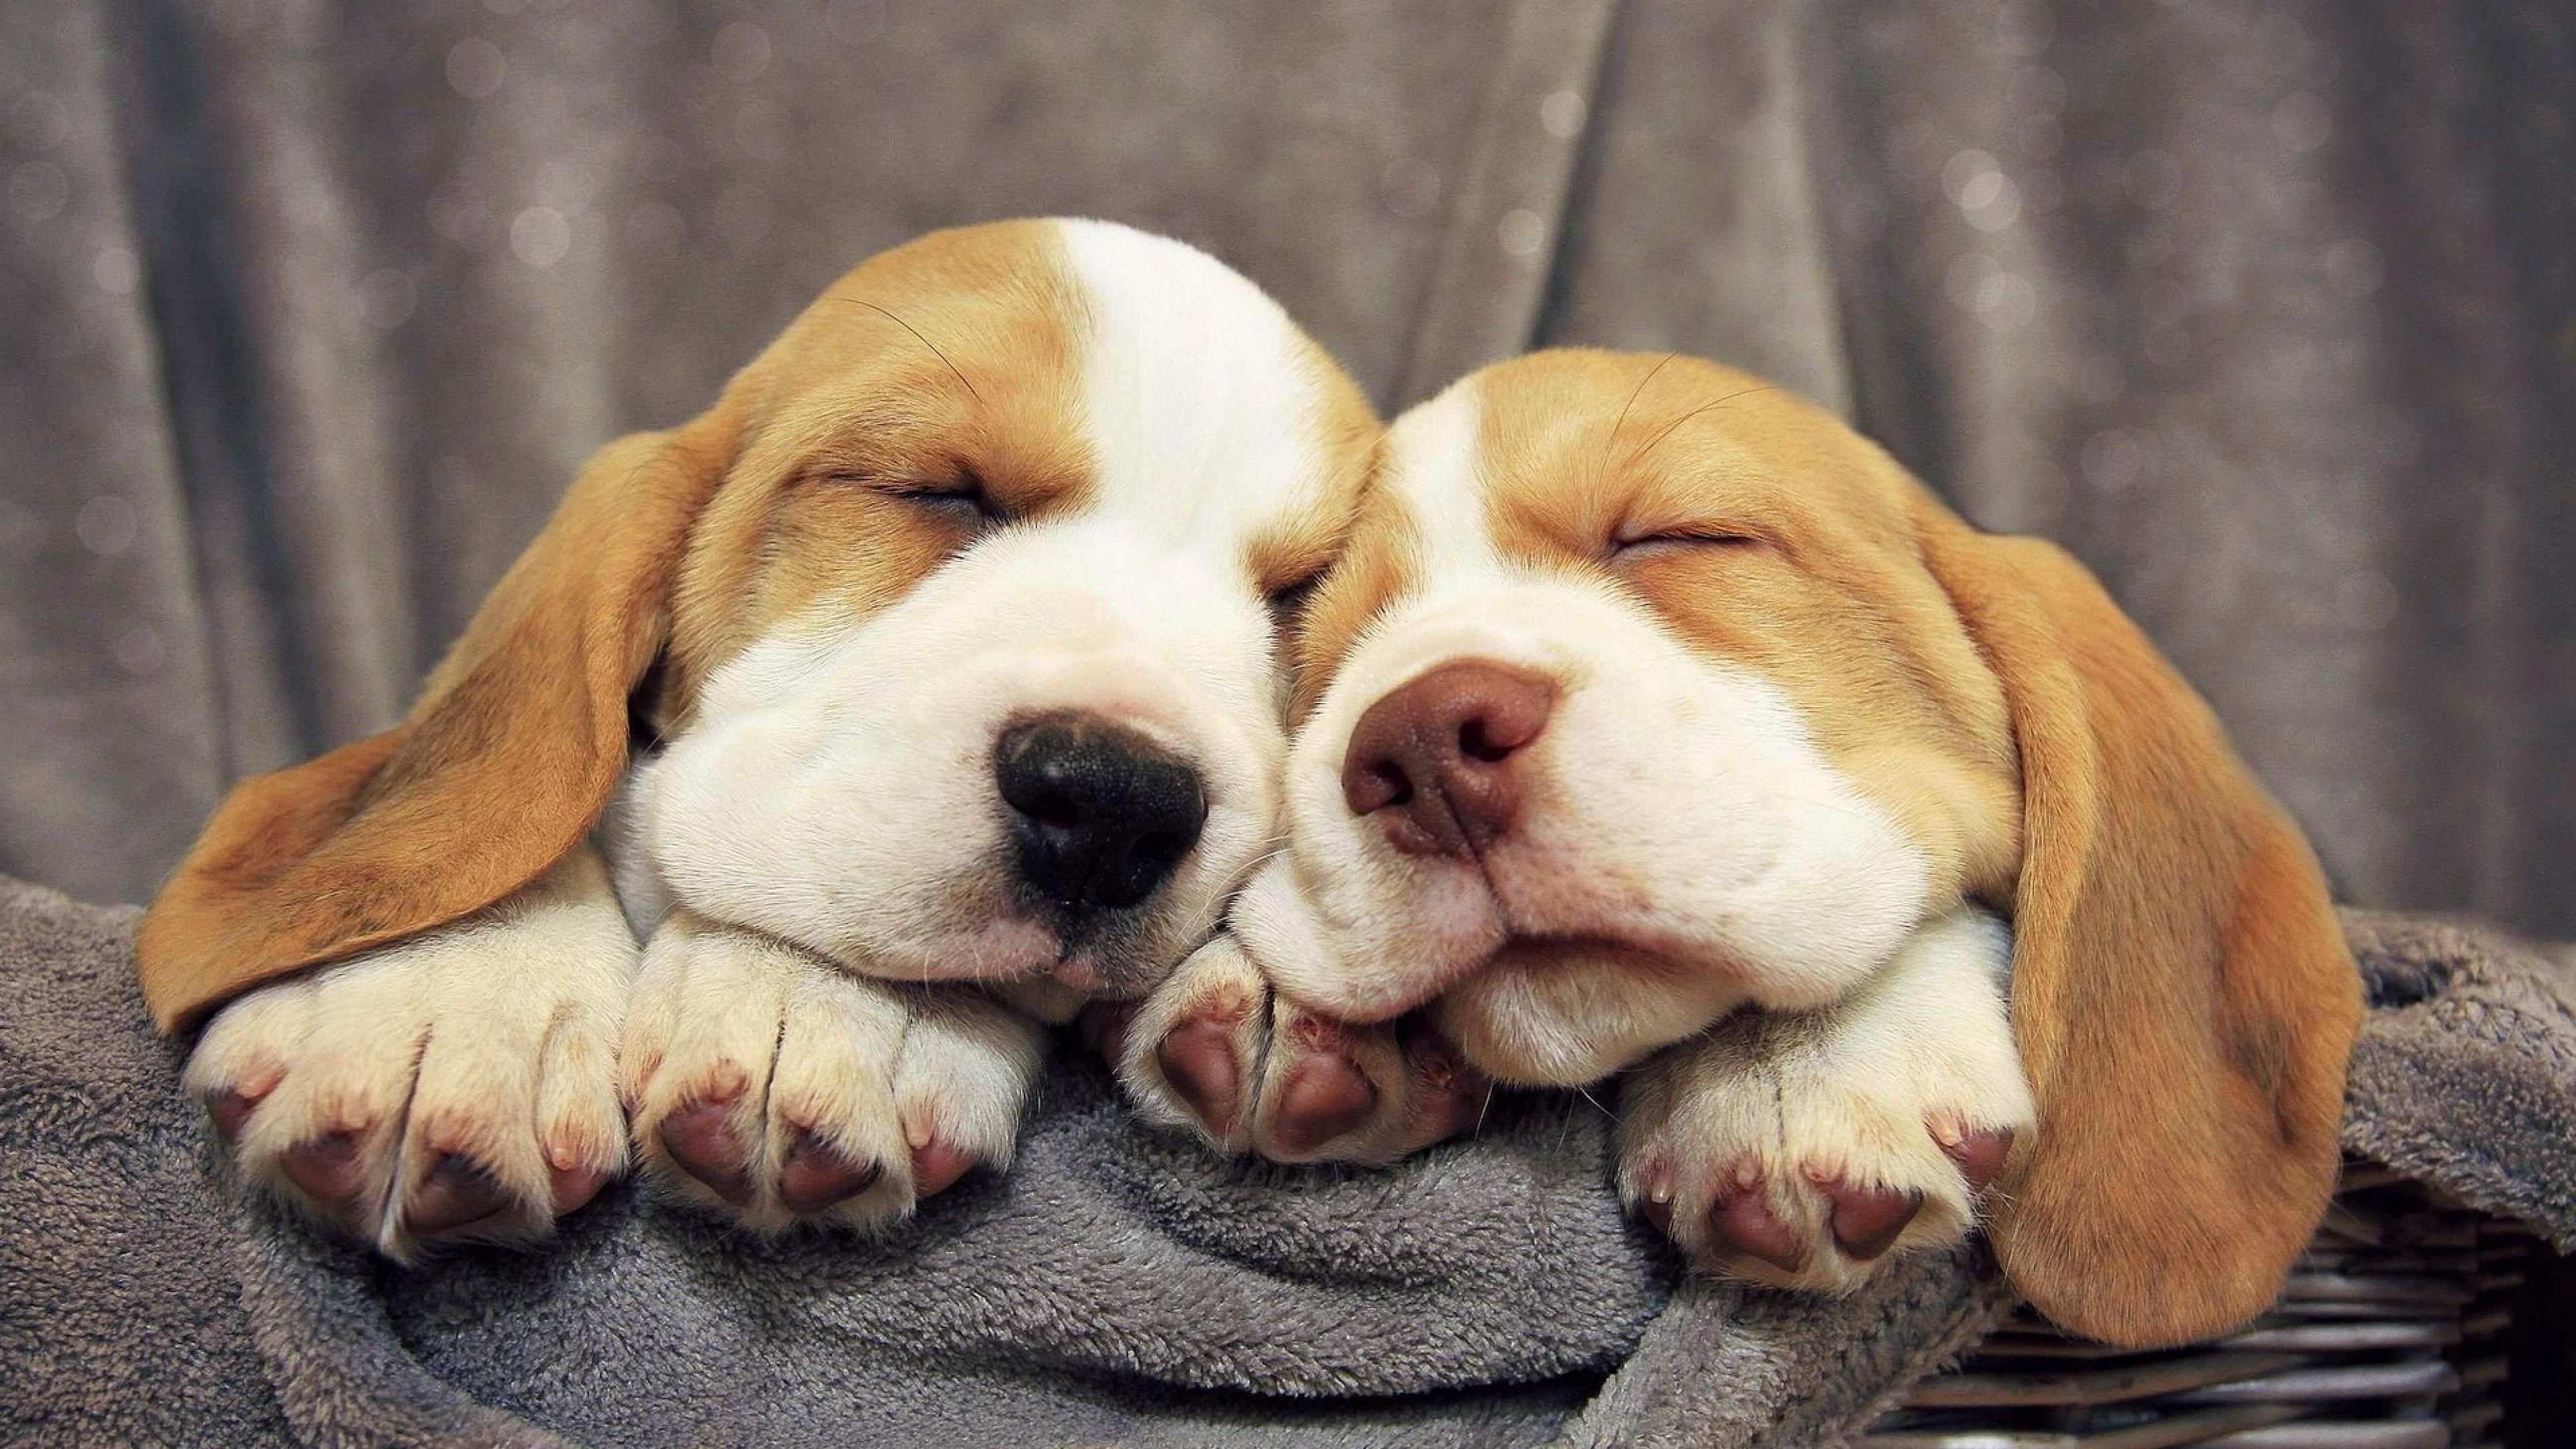 Cute dog wallpapers desktop mobile wallpaper pinterest